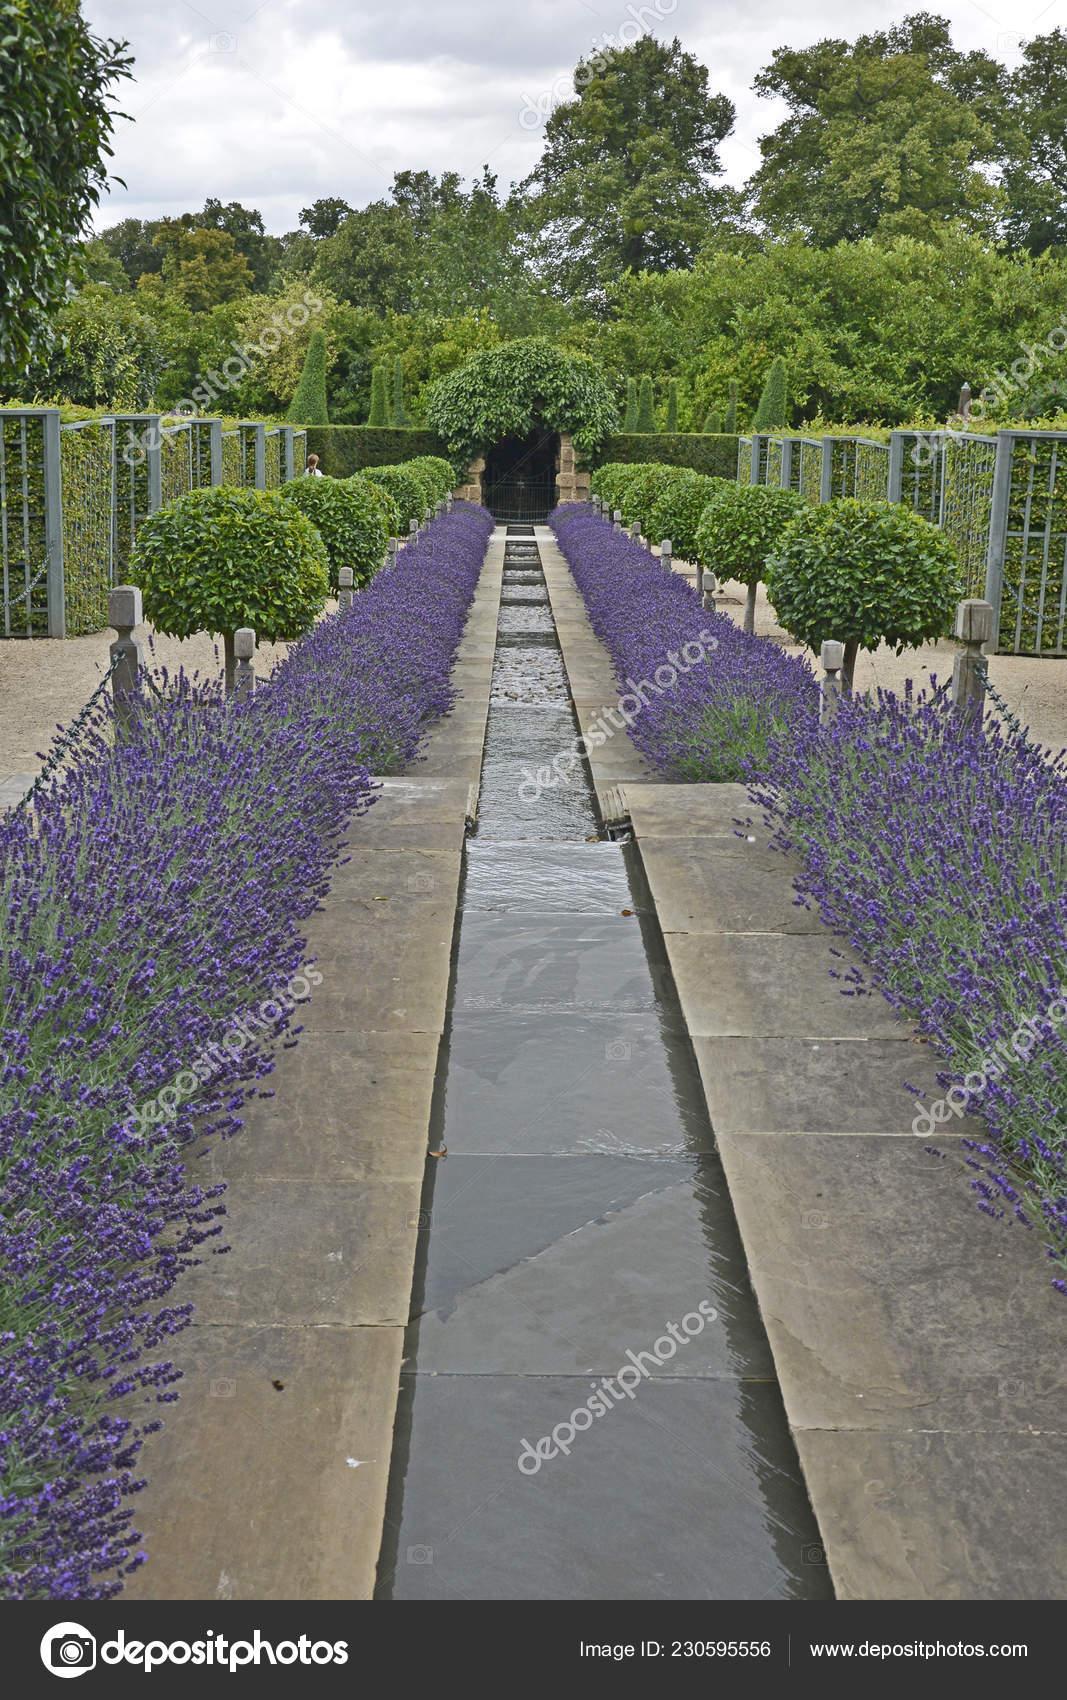 Images Garden Rill Garden Rill Flowing Water Lined Lavender Topiary Borders Country Garden Stock Photo C Gardenguru 230595556